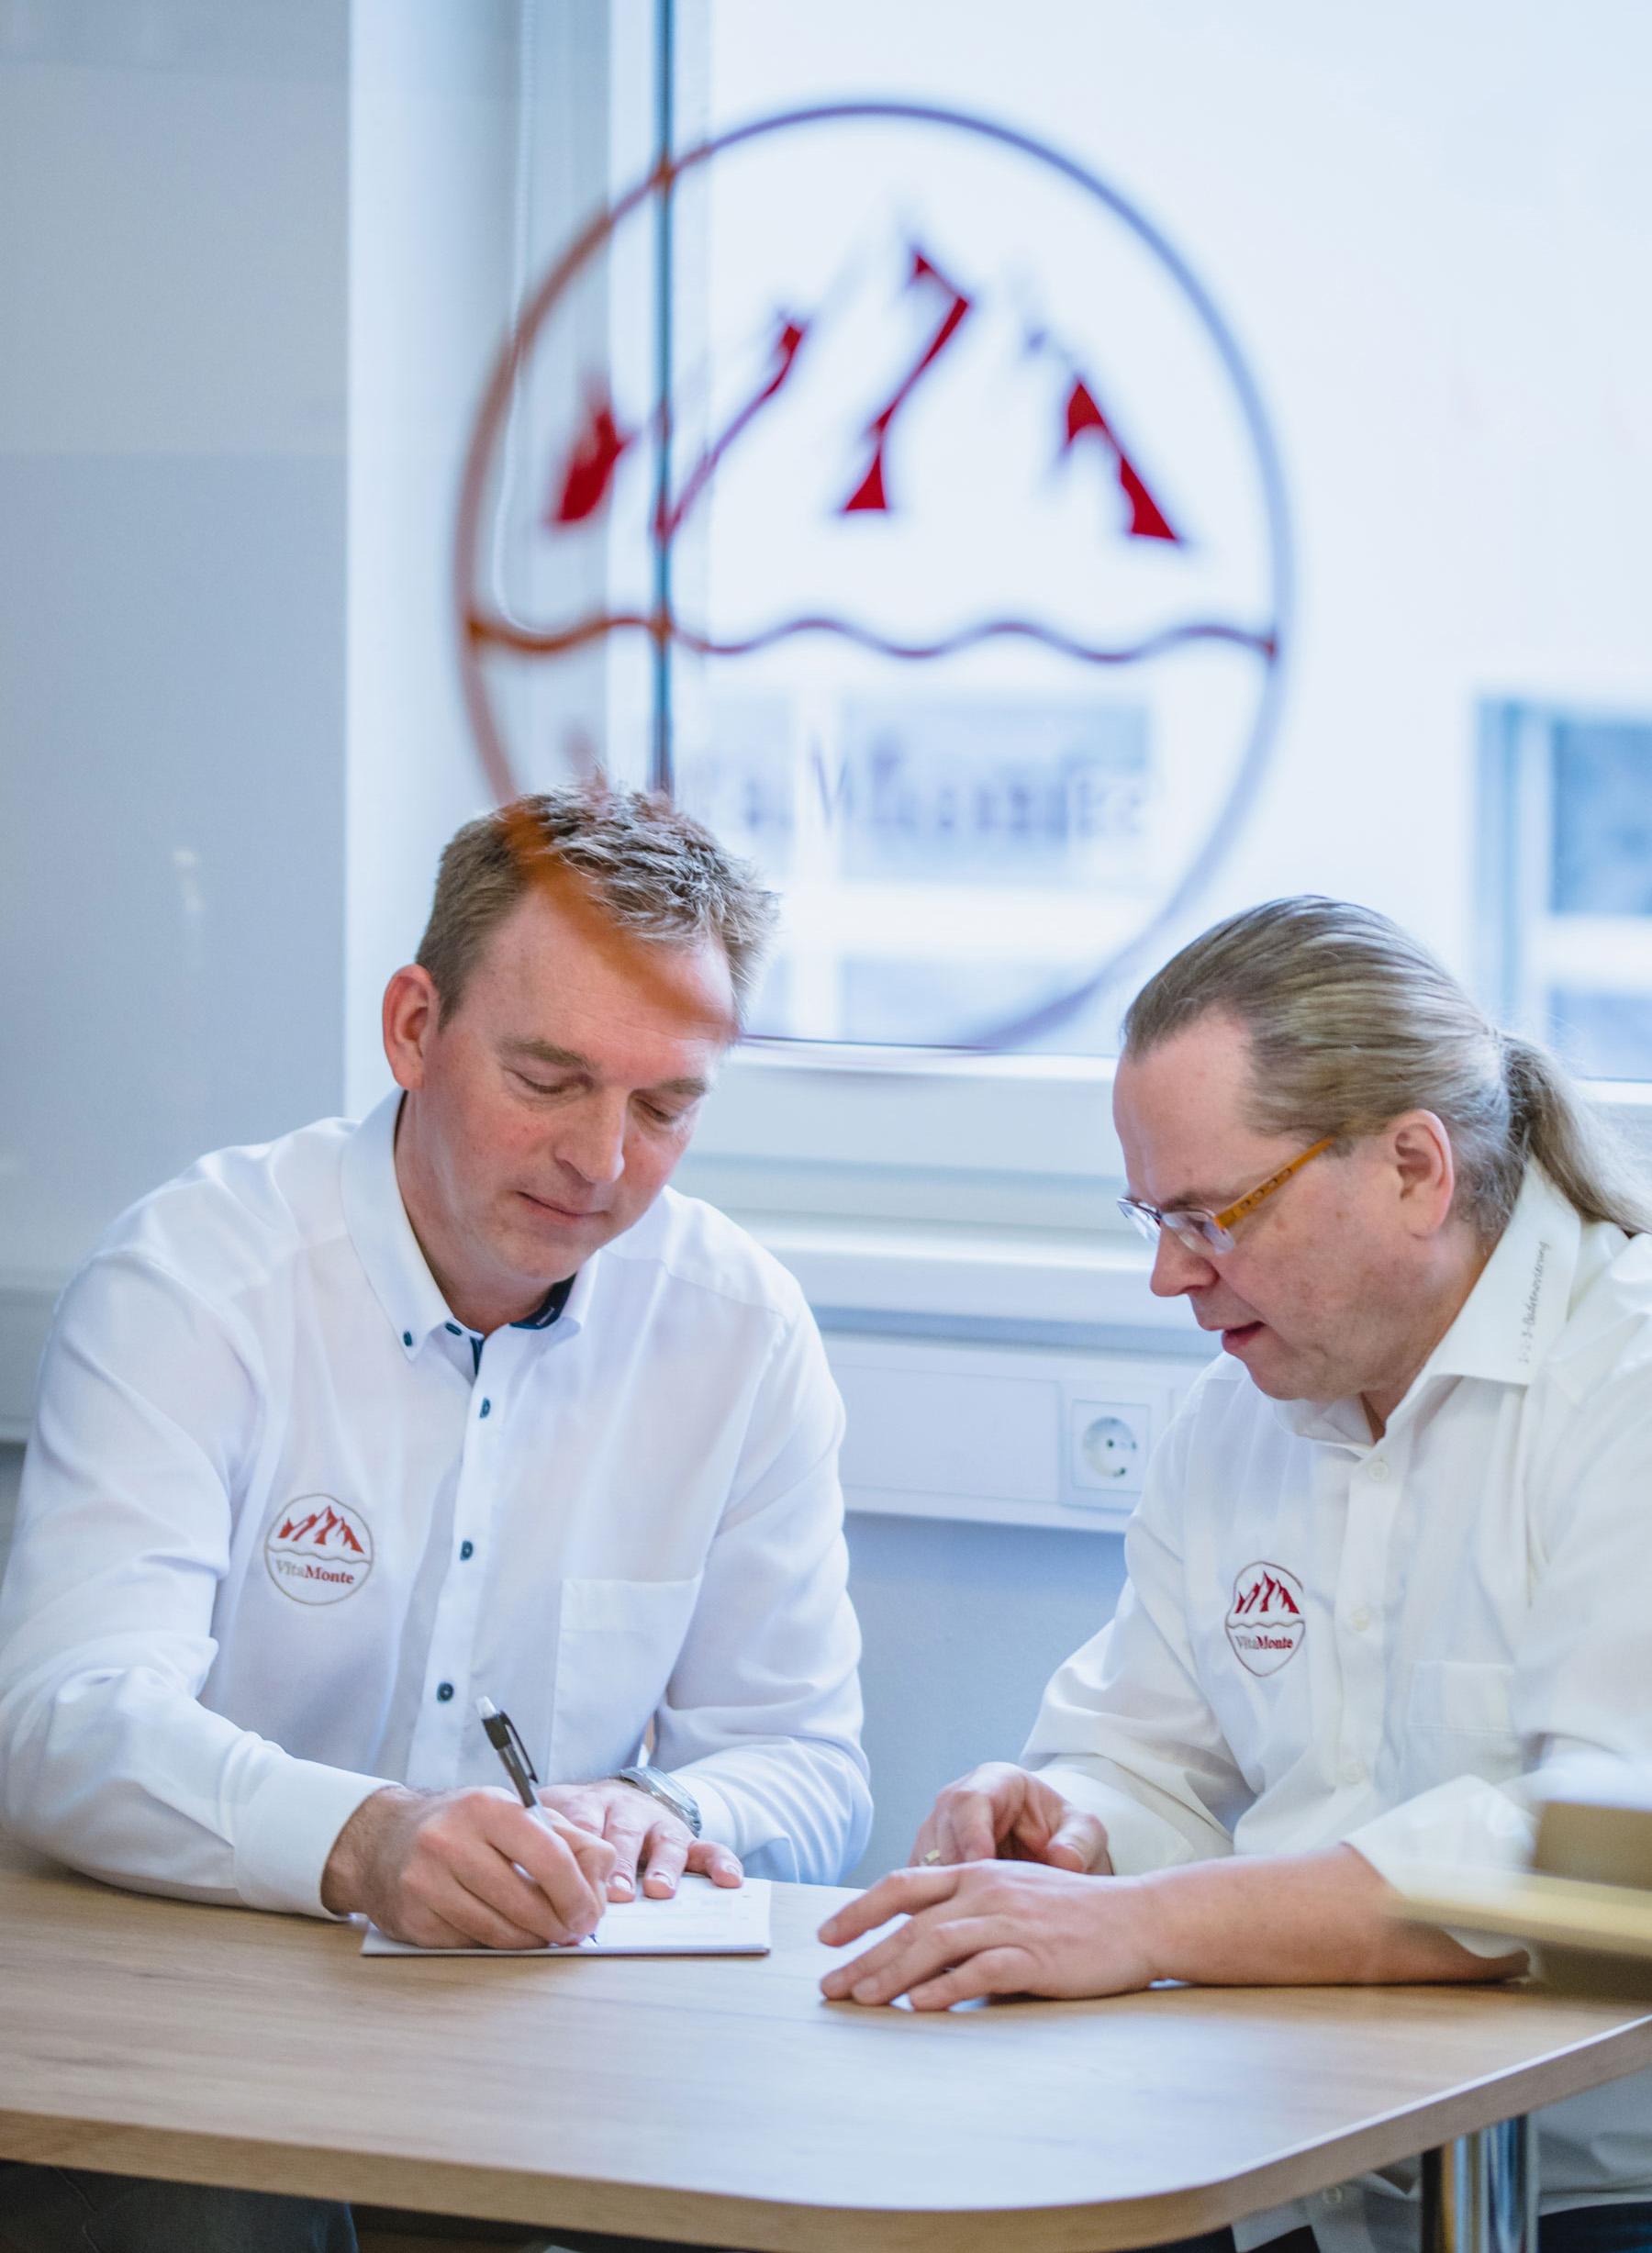 Jürgen Harald Büro VitaMonte GmbH